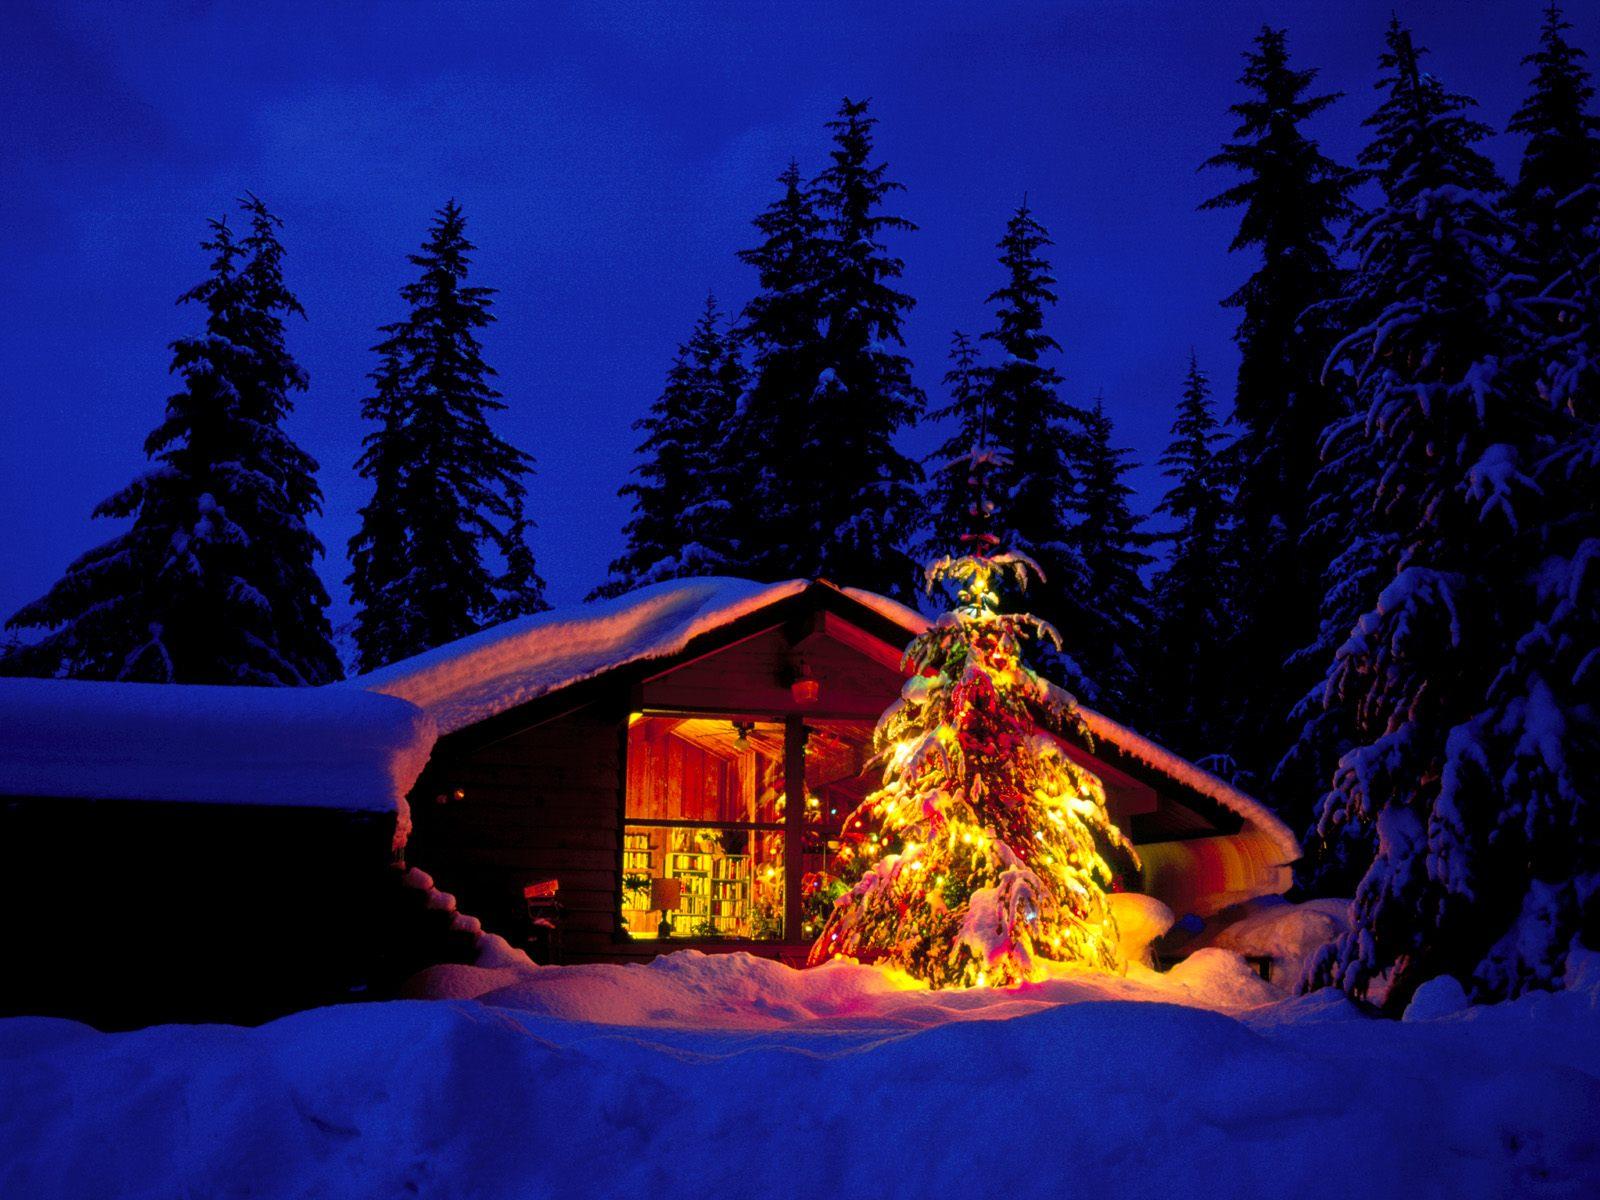 Christmas Wallpaper 3D Wallpaper Nature Wallpaper Download 1600x1200